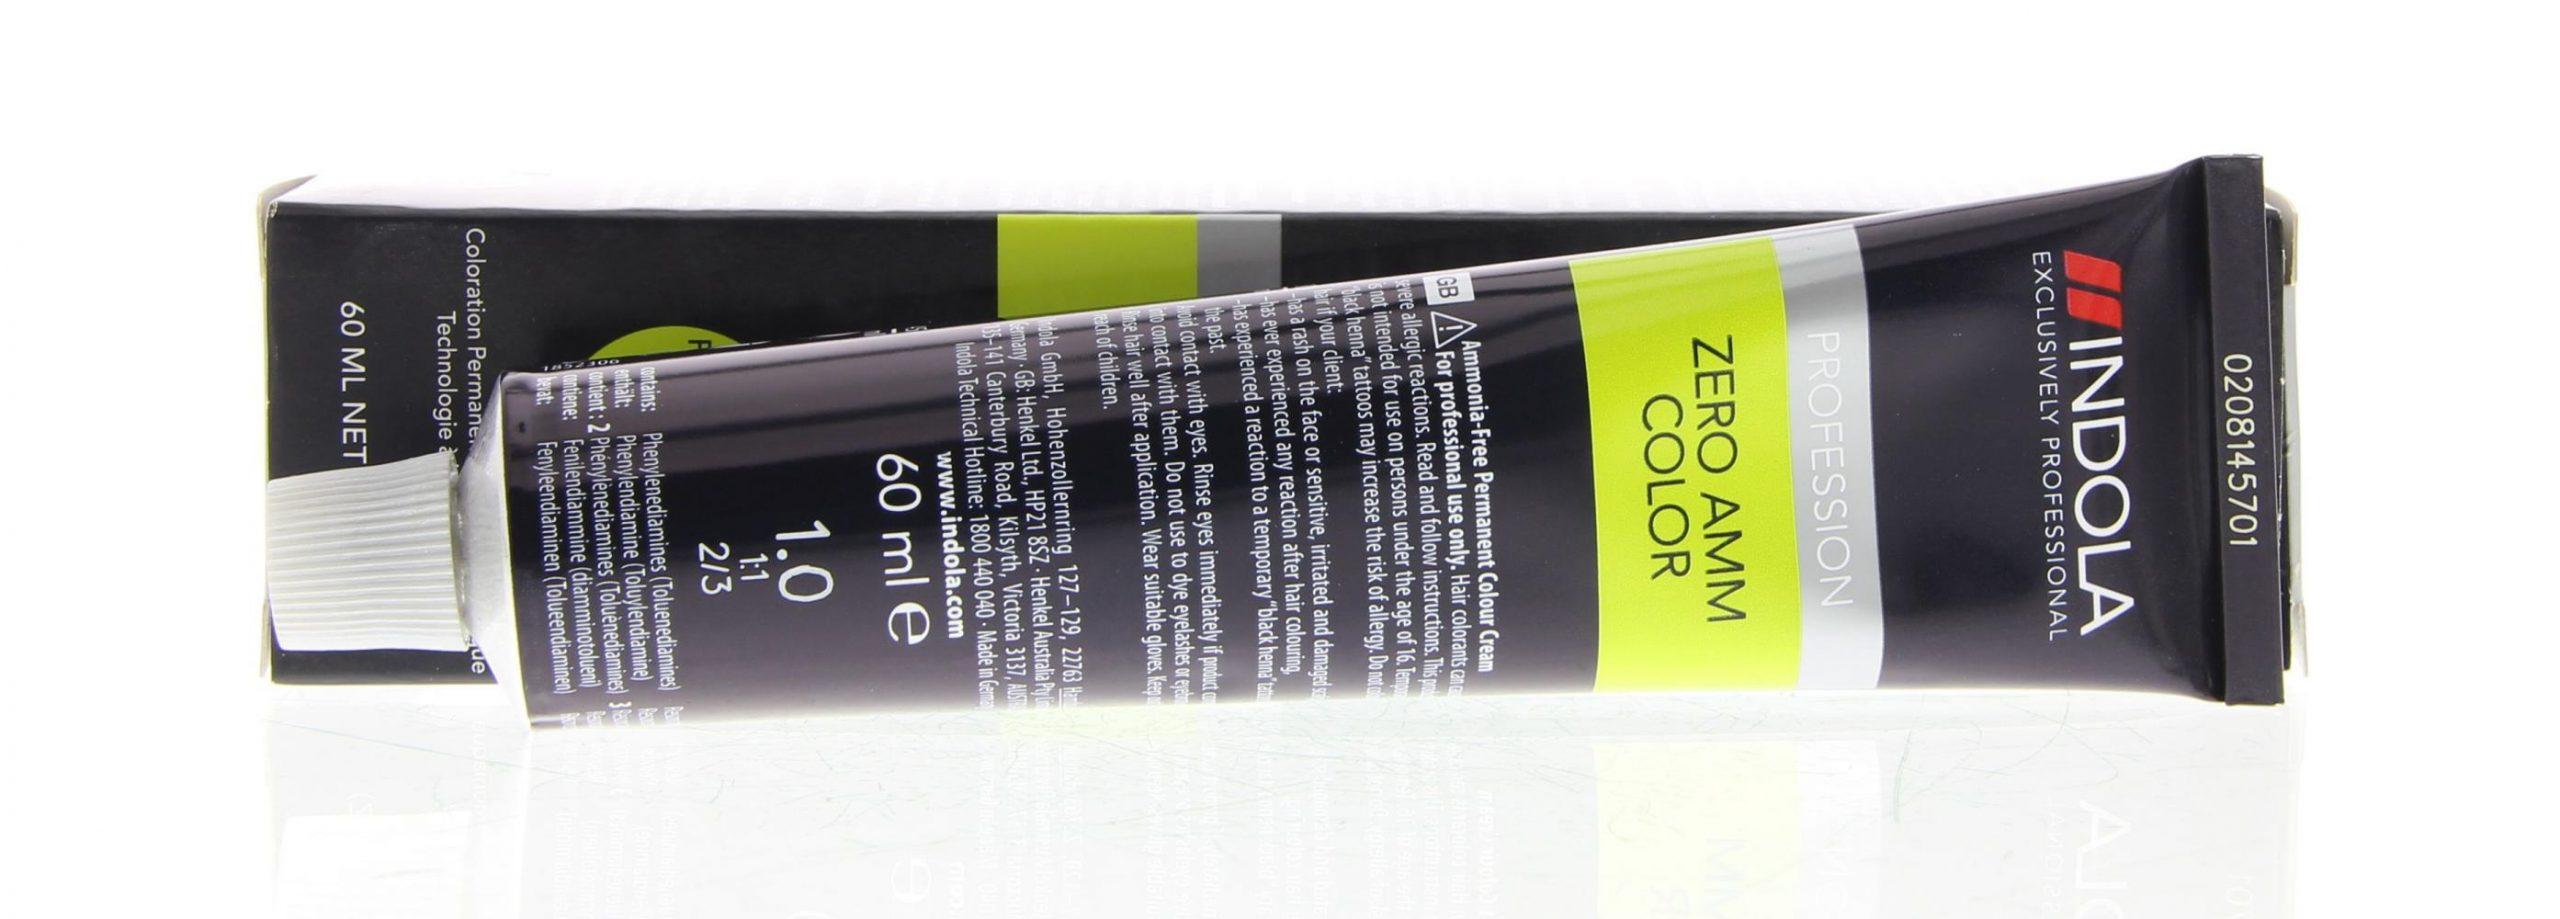 Indola Profession Zero Amm Color No Ammonia Permanent Color Haarverf 5.0  60ml